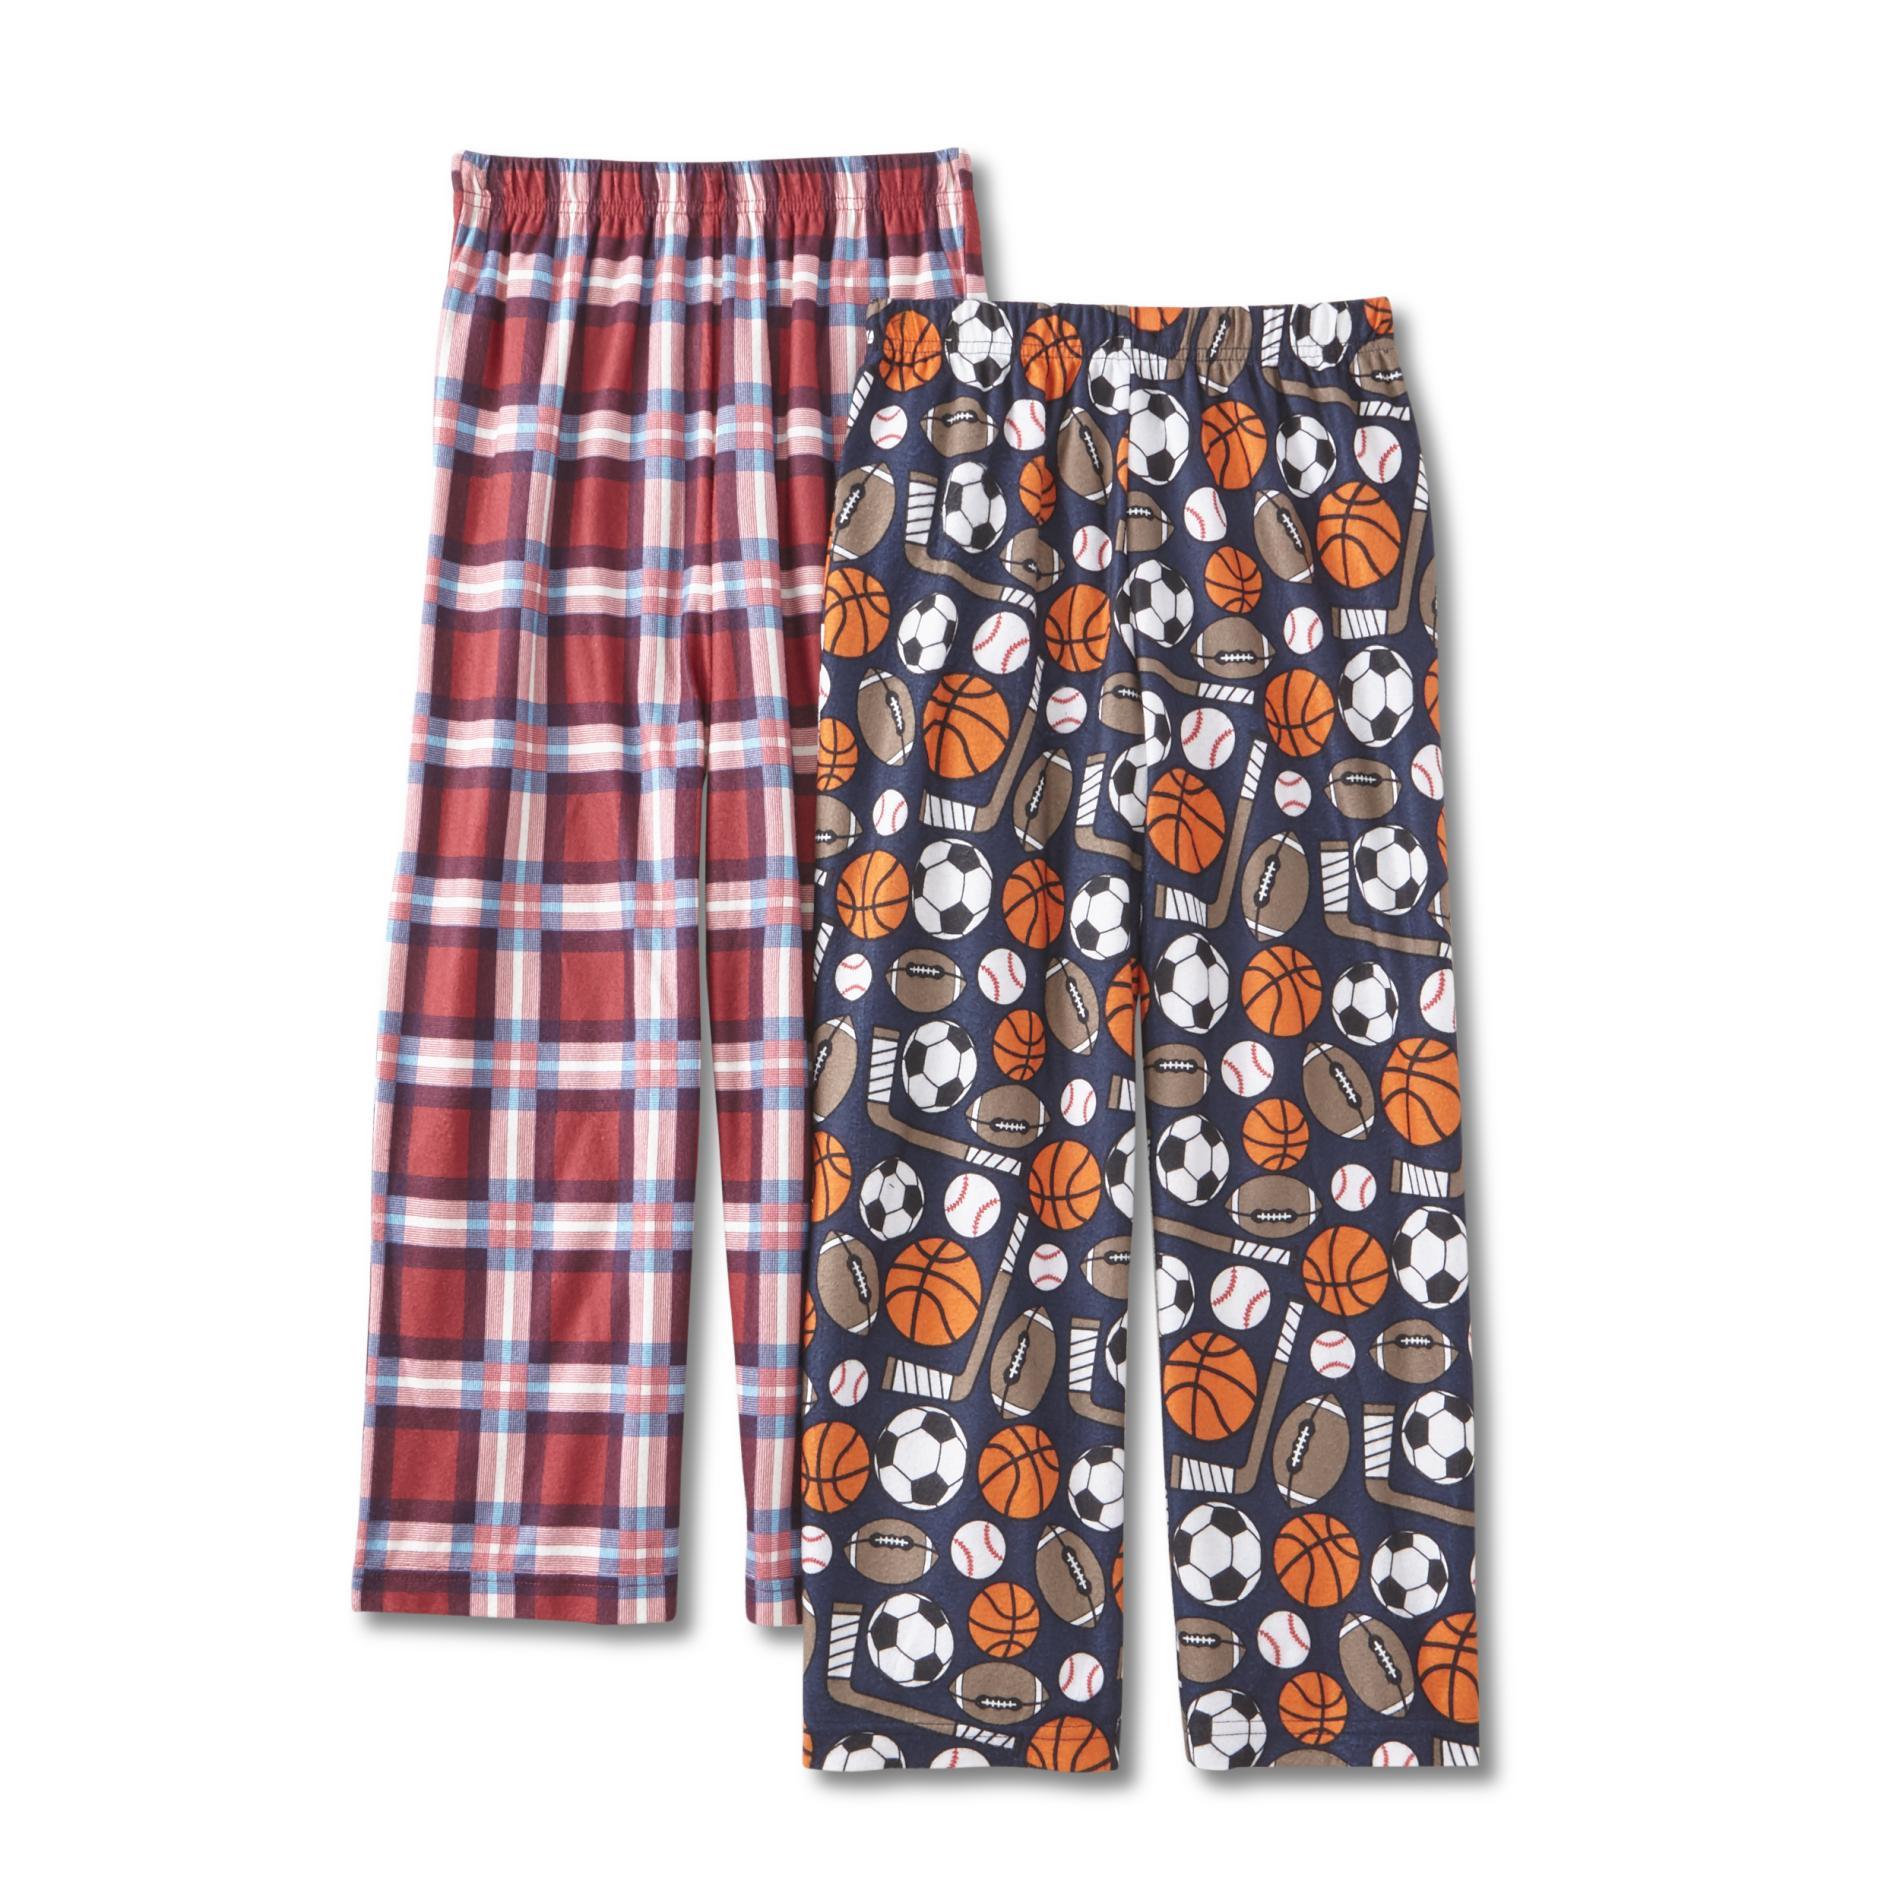 Joe Boxer Boys' 2-Pack Pajama Pants - Plaid & Sports, Size: Medium, Medival Blue im test